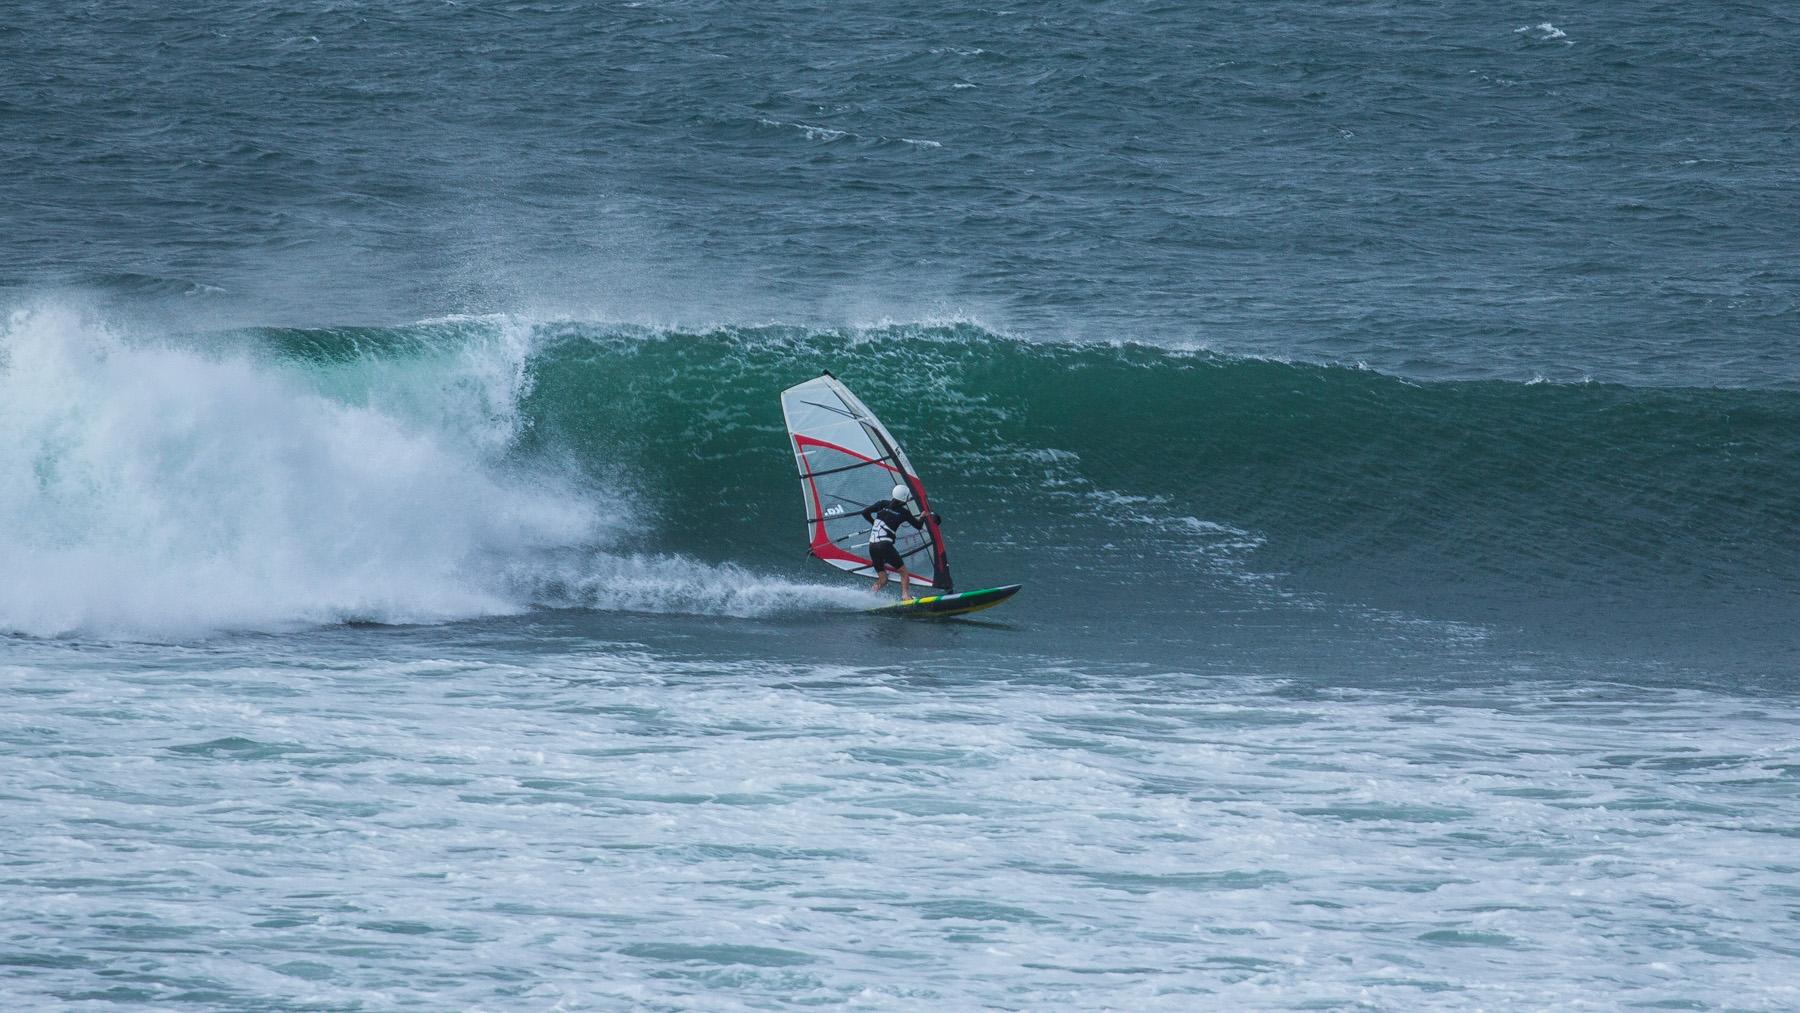 windsurfing phillip island right point